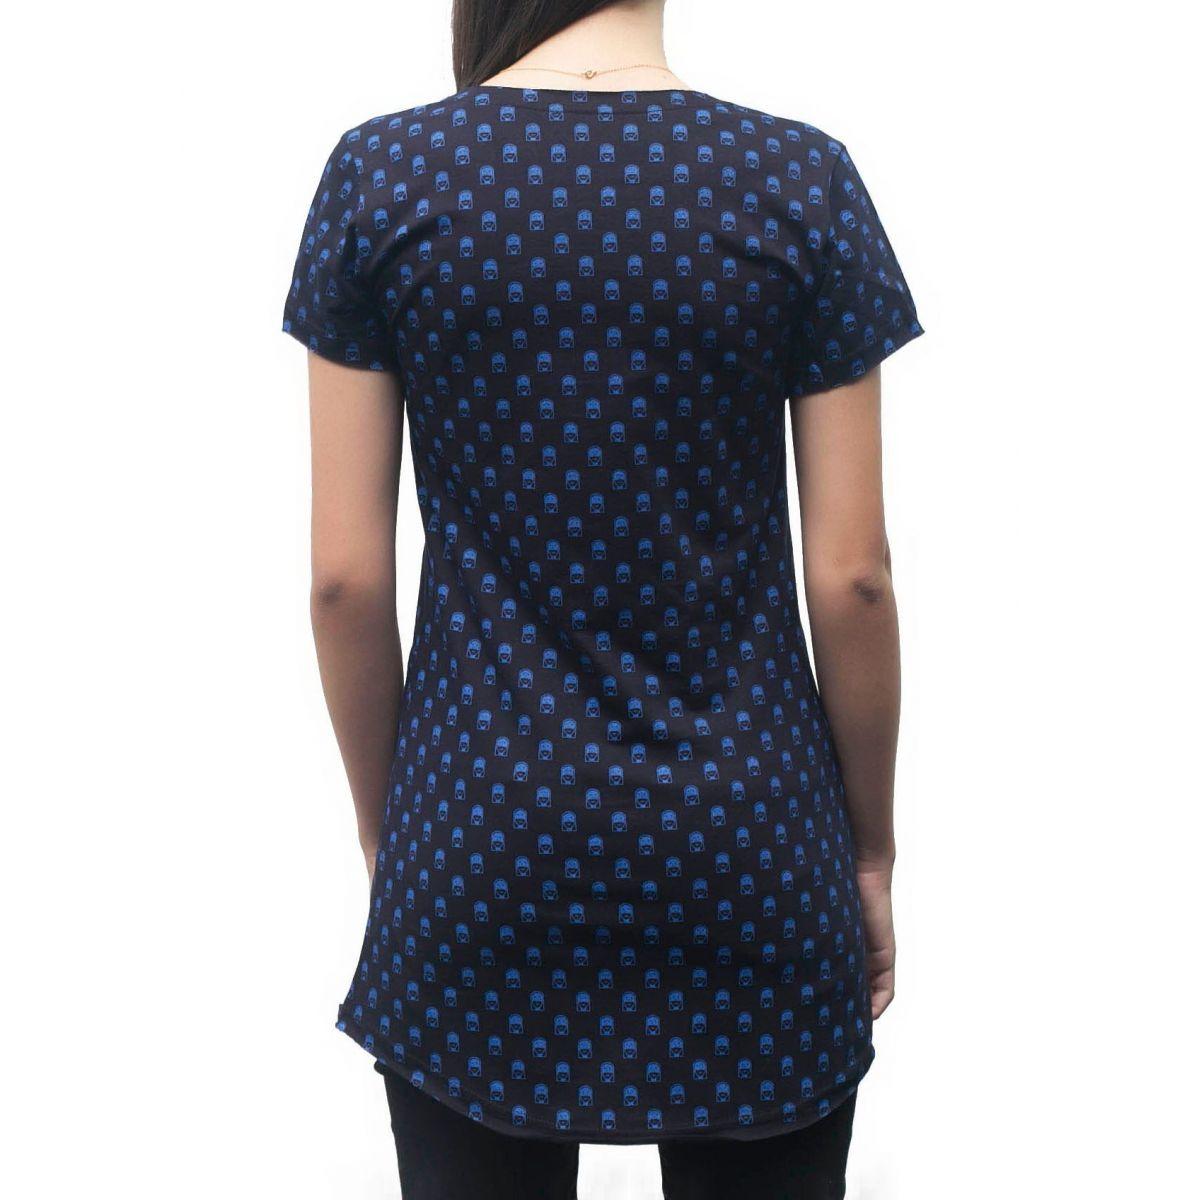 Camiseta Pattern Jesuscopy Feminina - #REINODEPONTACABEÇA  - Jesuscopy